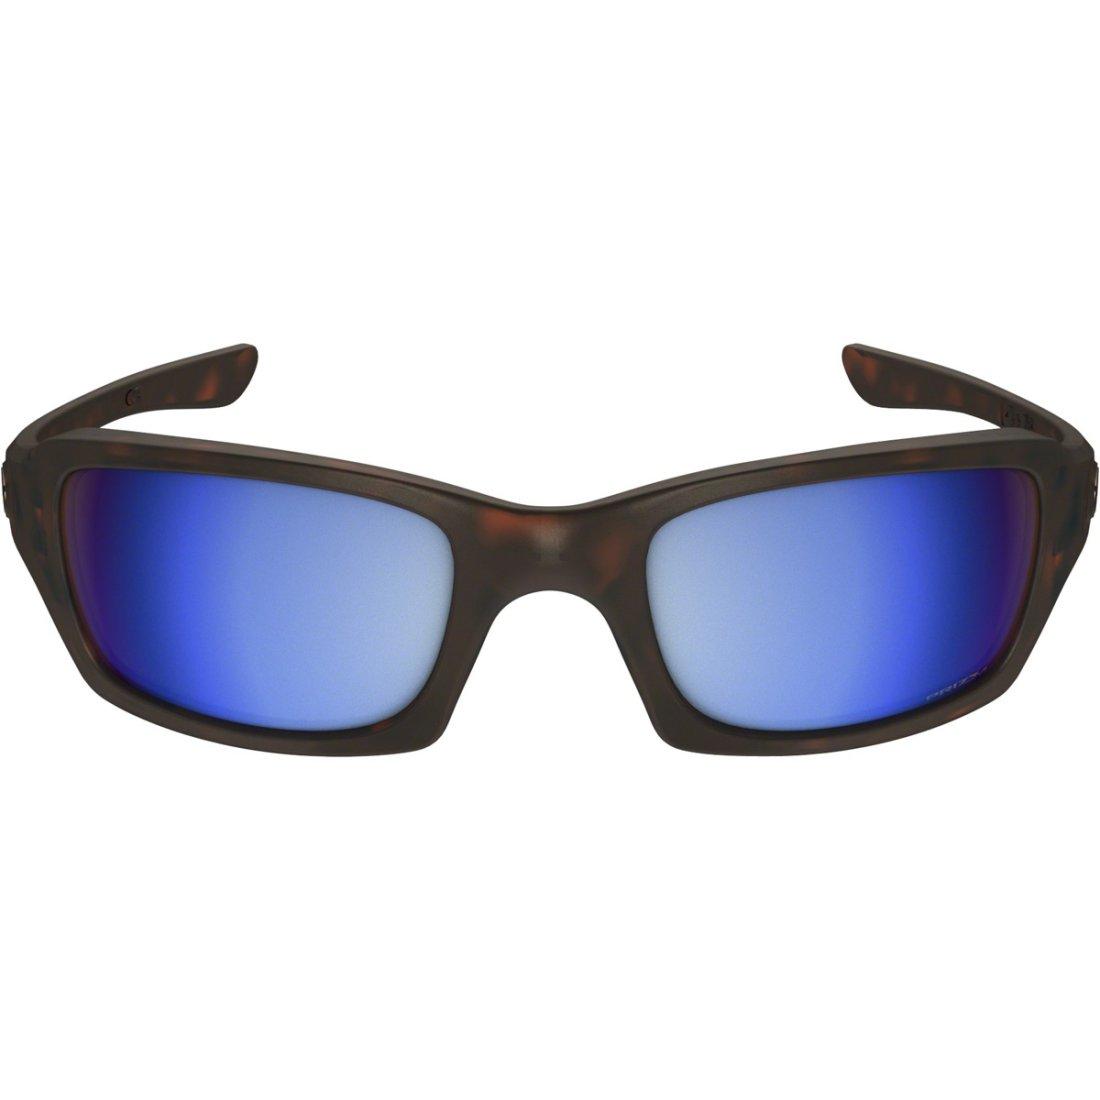 ab6221b1e7 OAKLEY Fives Squared Matte Tortoise   Prizm Deep Water Polarized Sun  glasses · Motocard